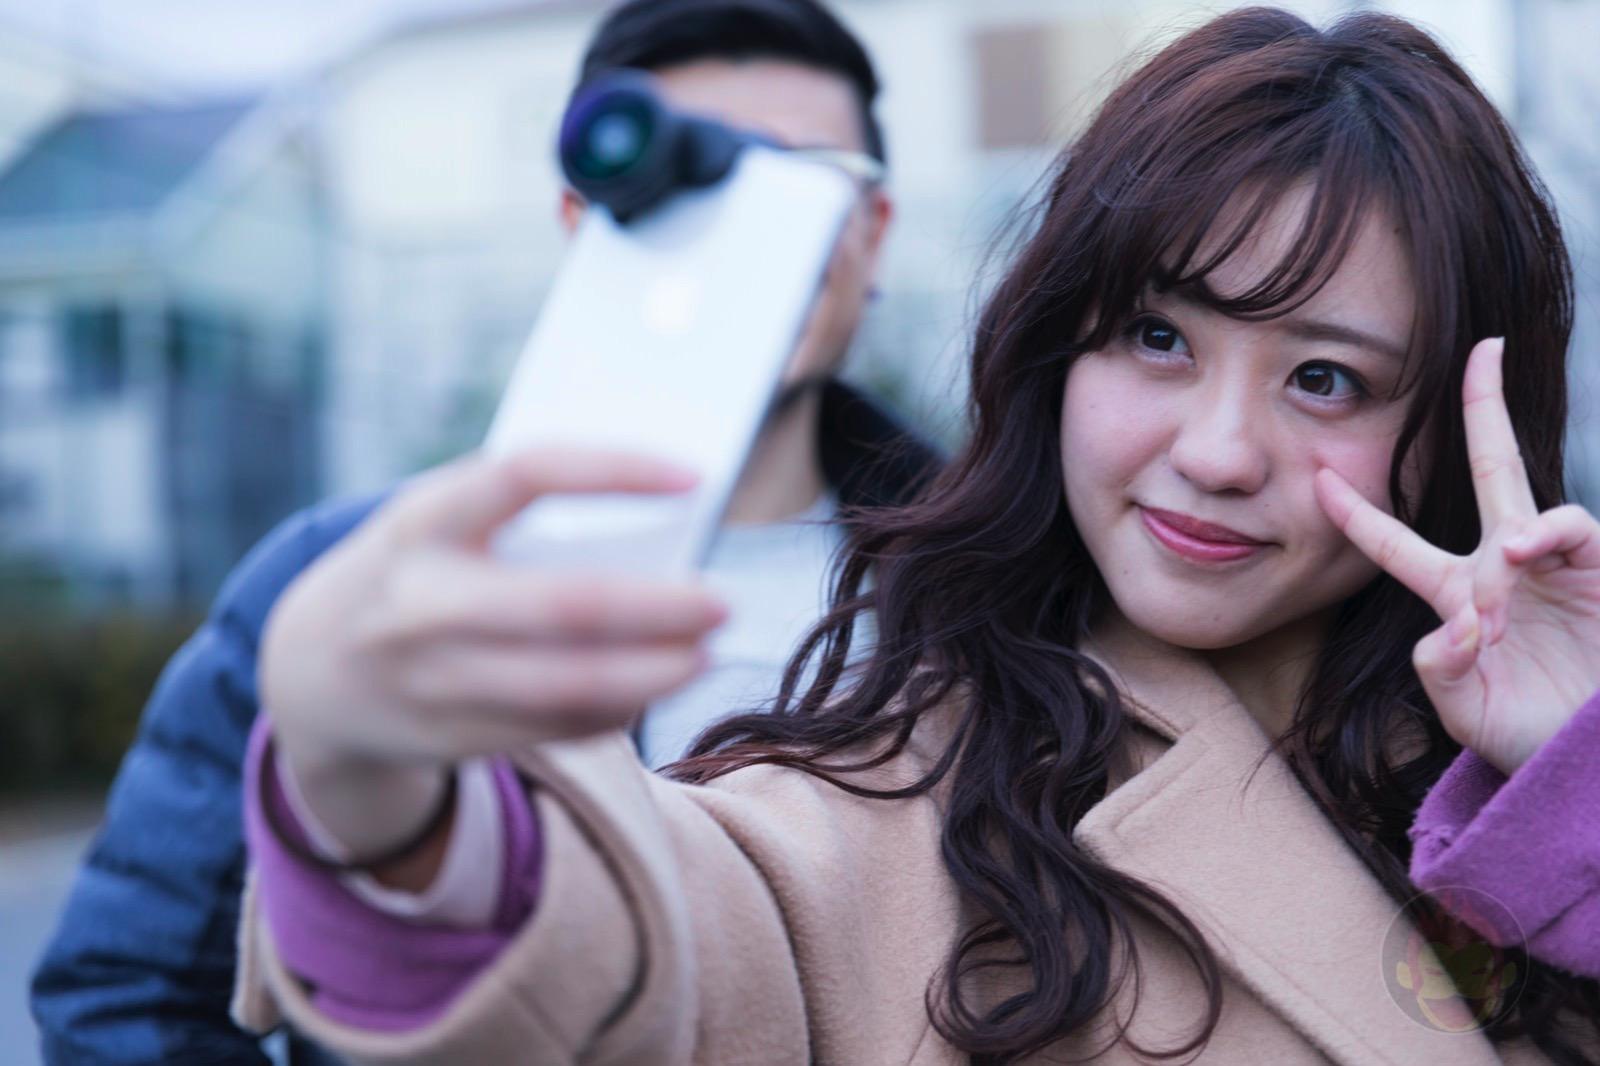 Fusion-Lens-360-iPhone-Camera-04.jpg